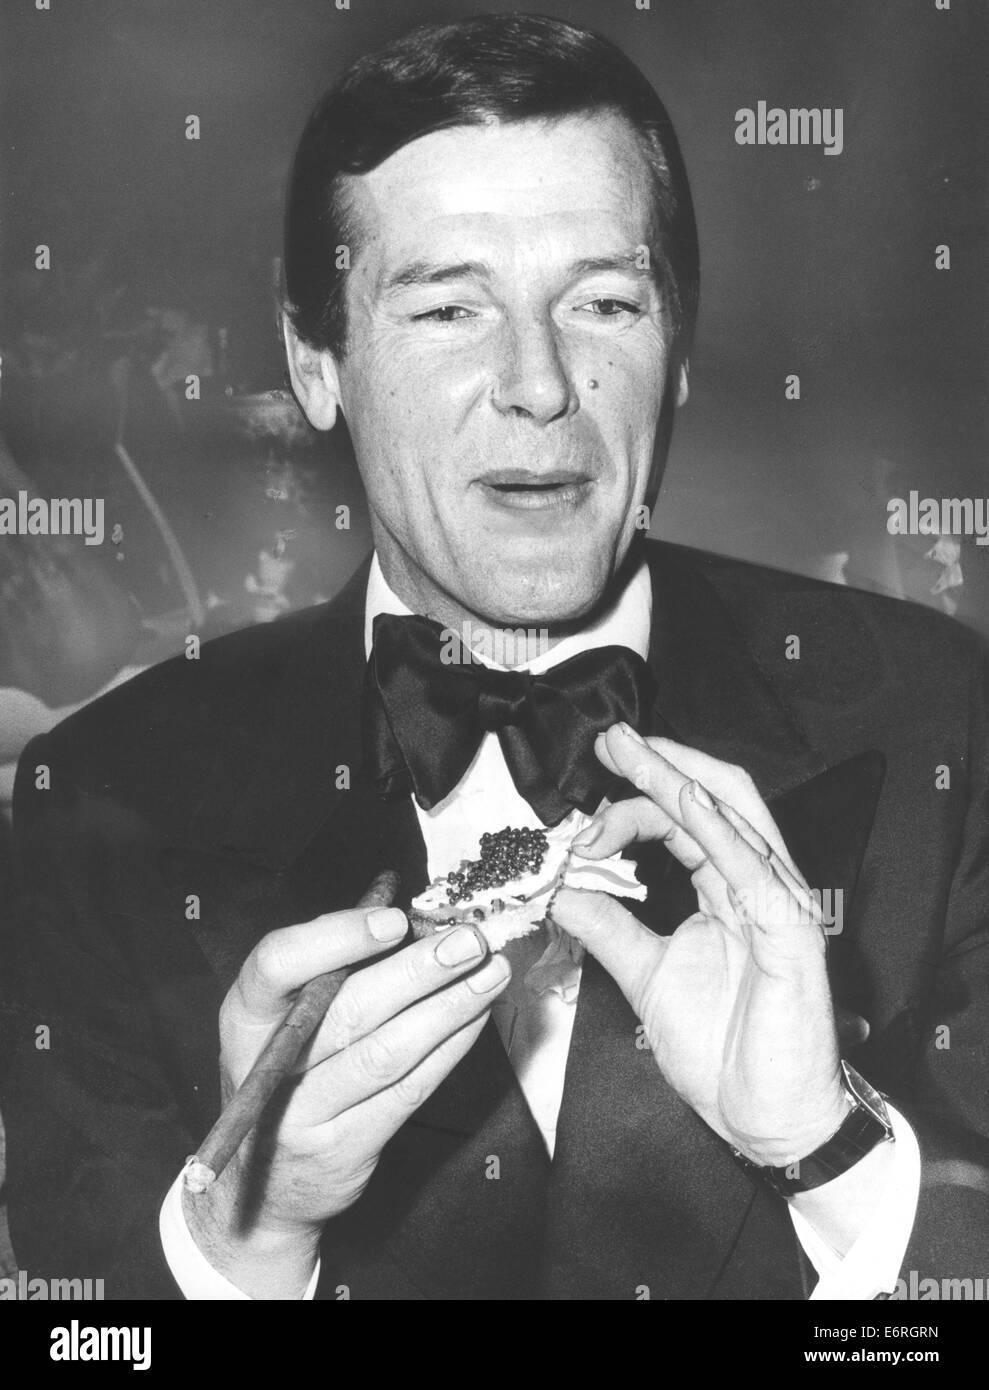 18 Januar 1975 München Deutschland Sir Roger George Moore Kbe